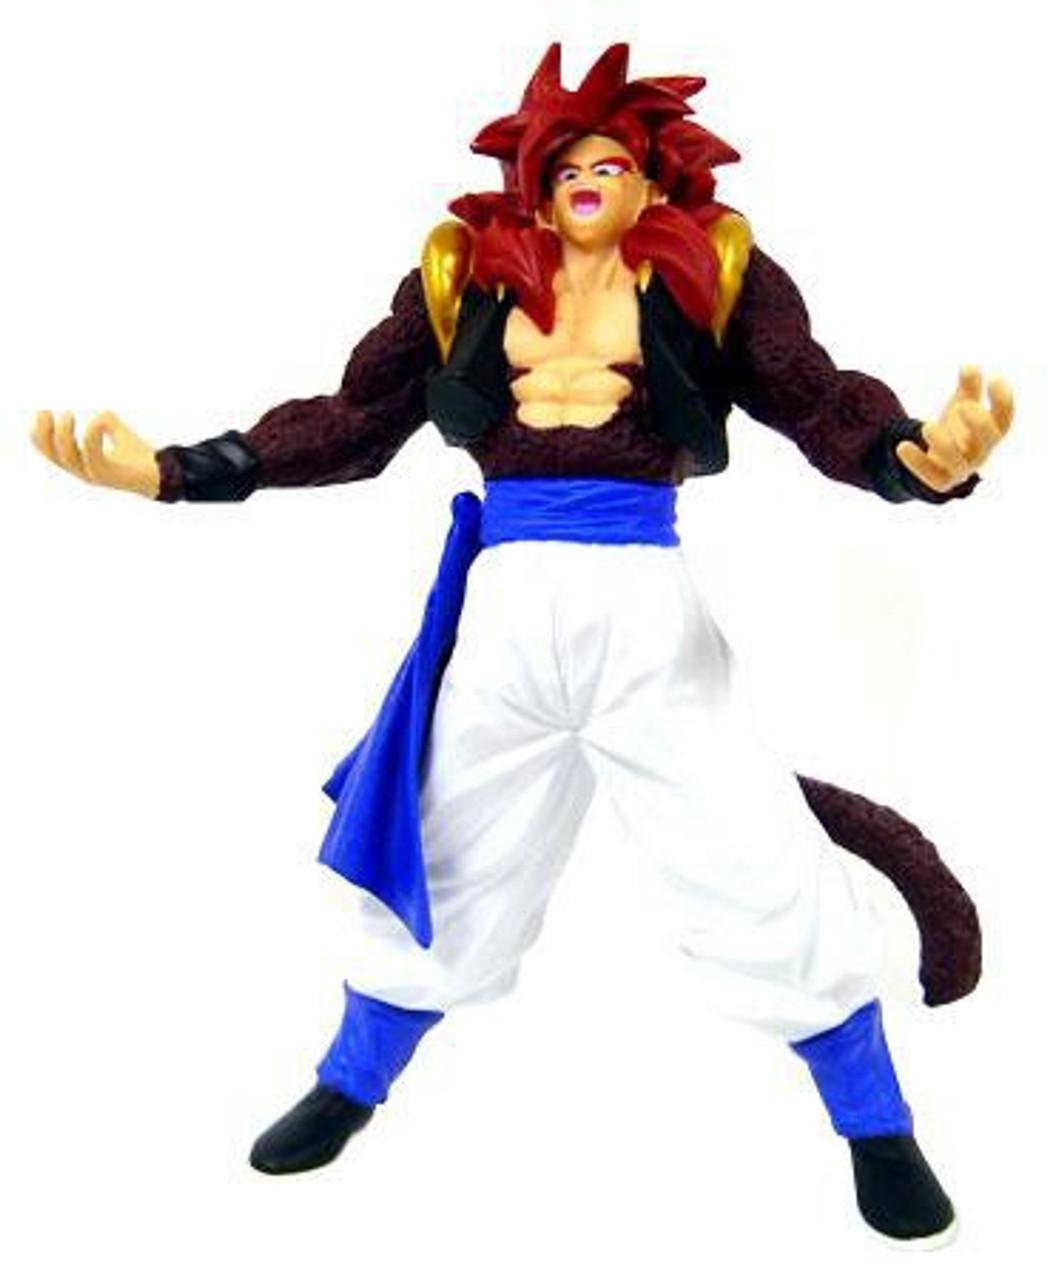 Dragon Ball Gt Super Saiyan 4 Gogeta 9 Inch Vinyl Statue Ss4